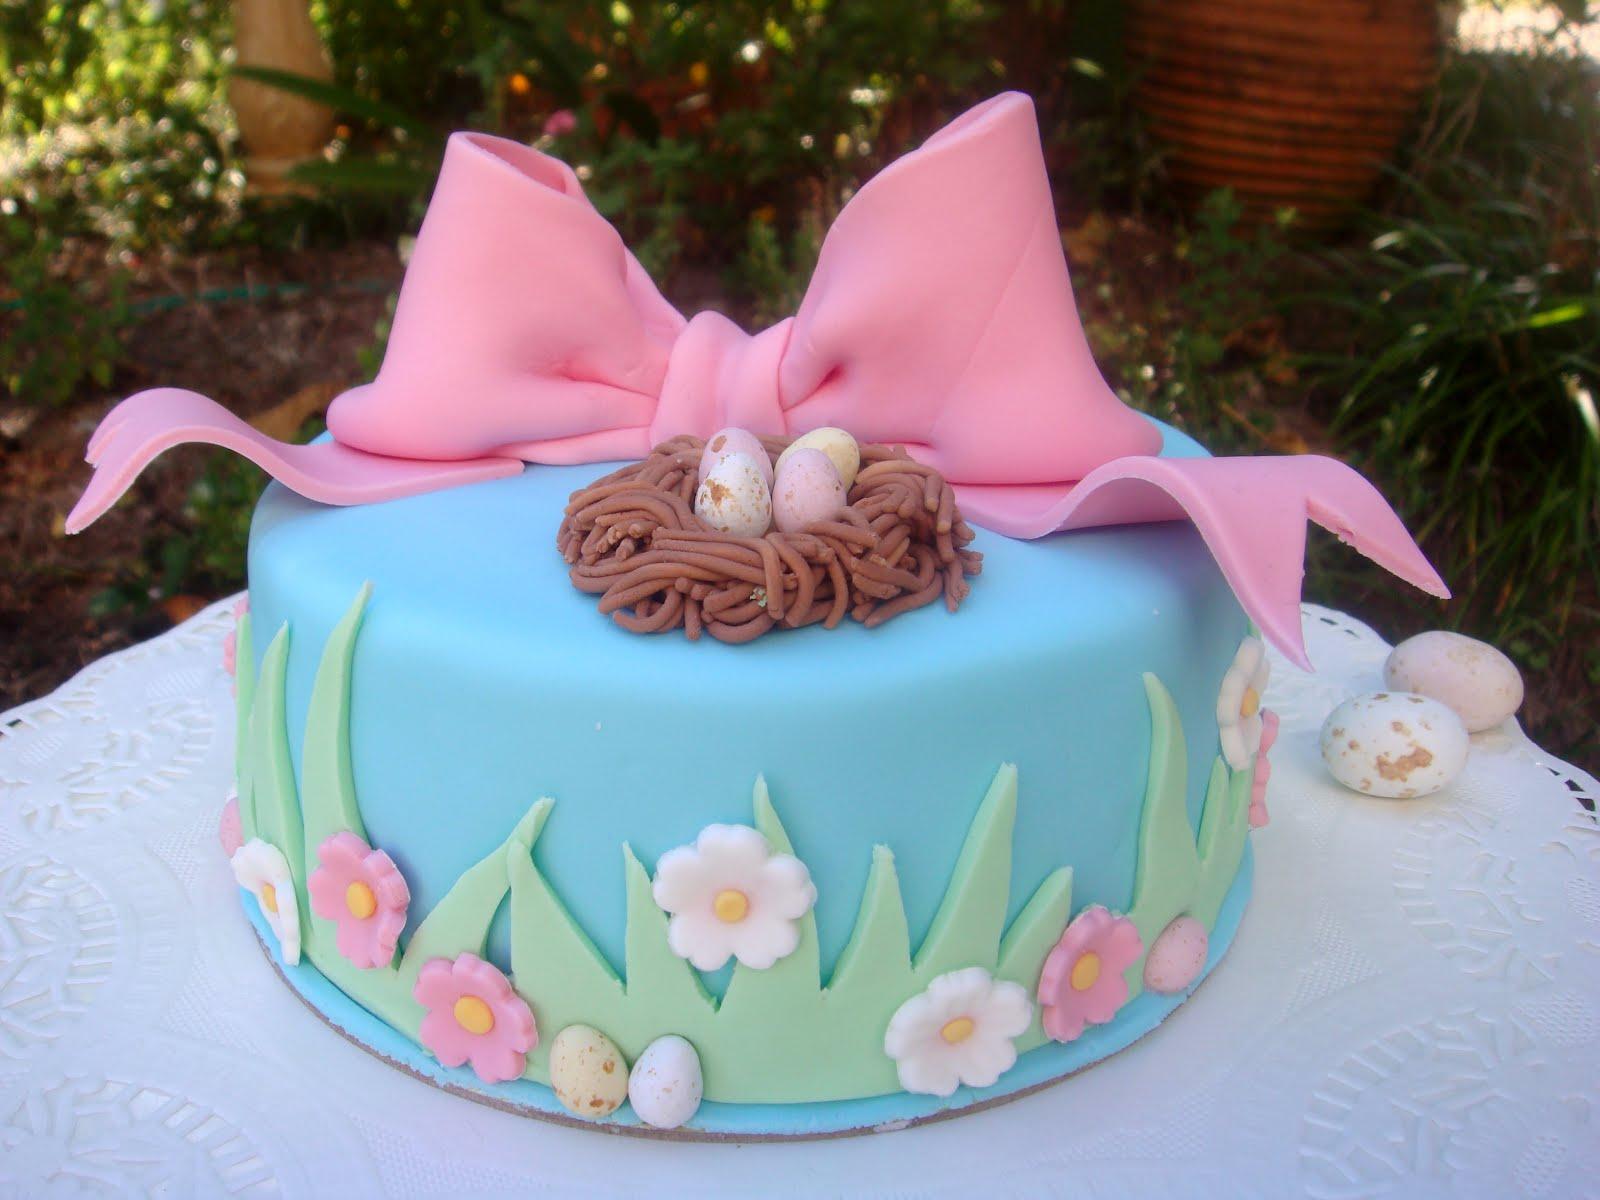 Easter Cake Design Photos : butter hearts sugar: Cute Easter Cakes